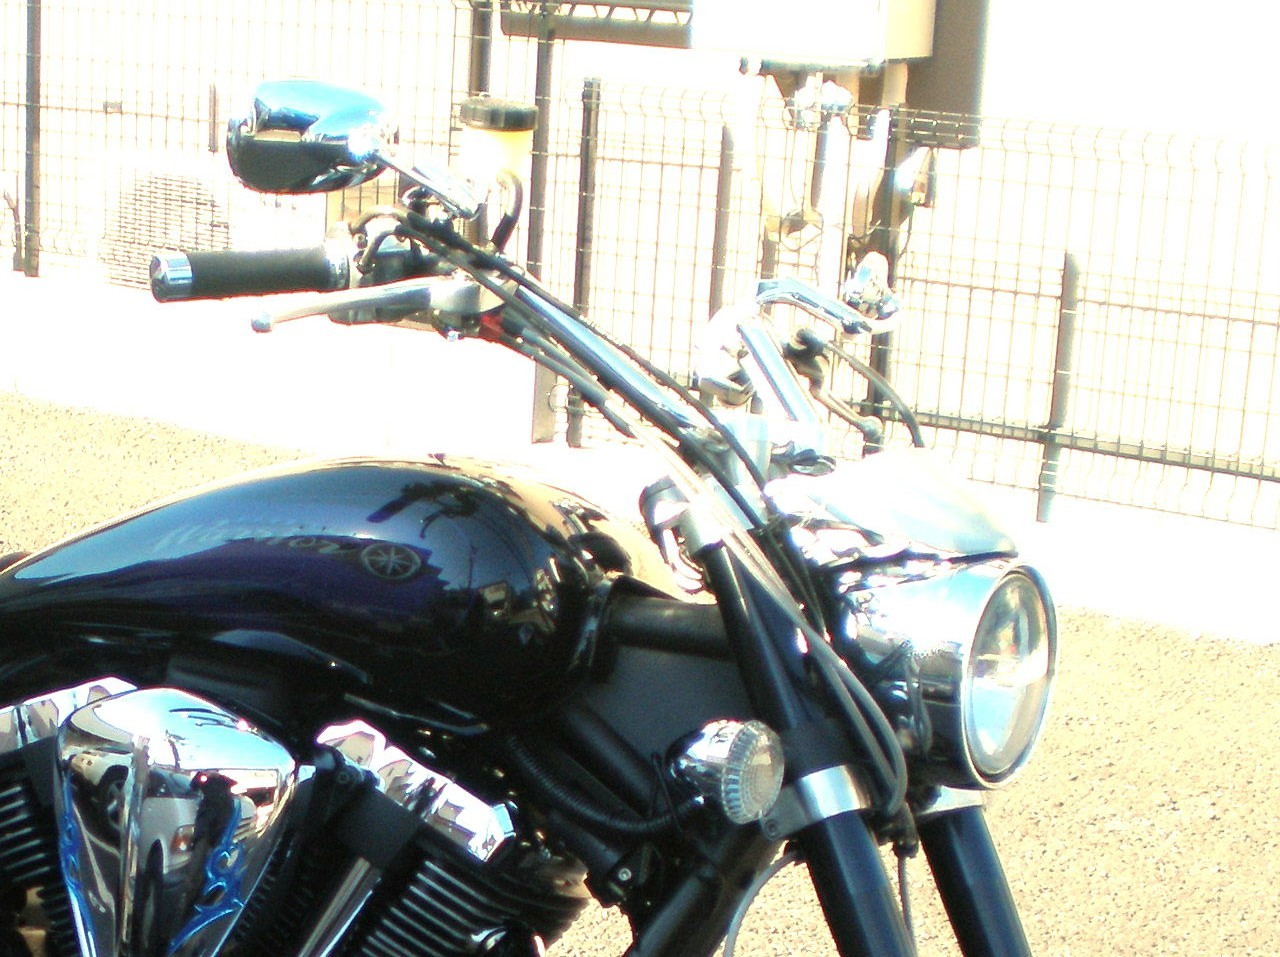 020 M.C.A. \'03 YAMAHA Road Star Warrior XV1700PC_b0133126_09492258.jpg